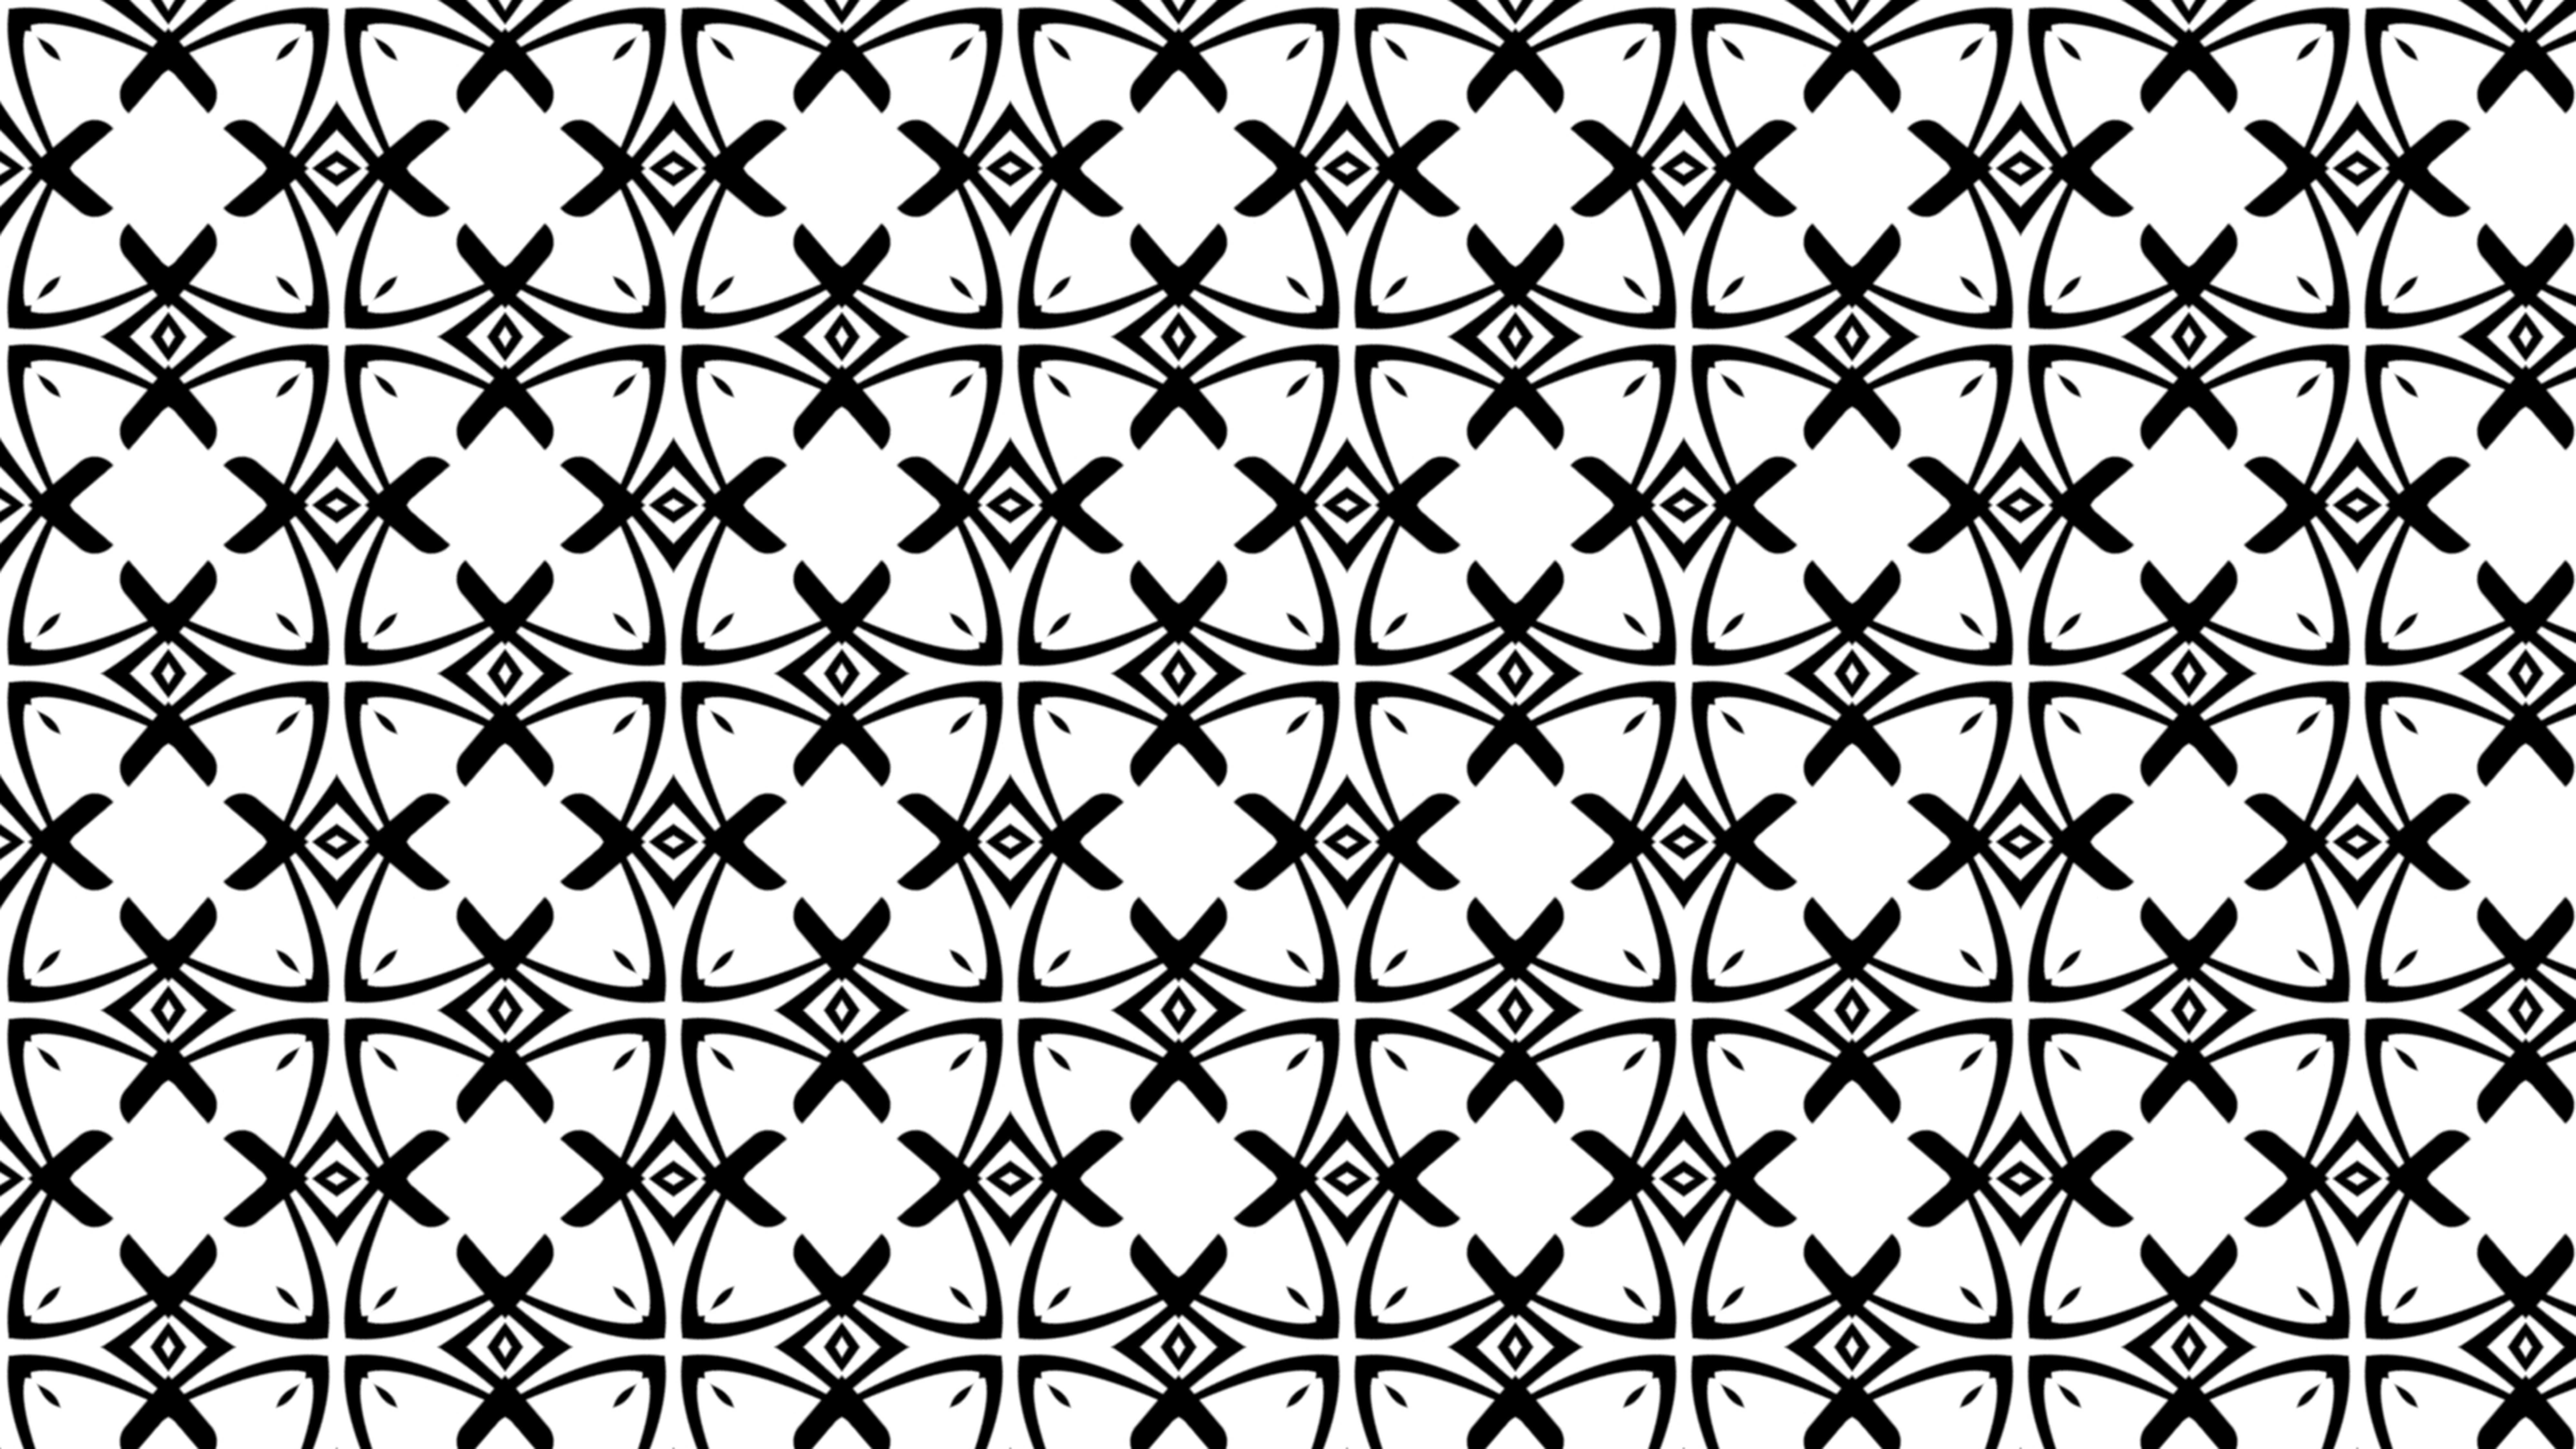 Black And White Geometric Ornament Wallpaper Pattern Design